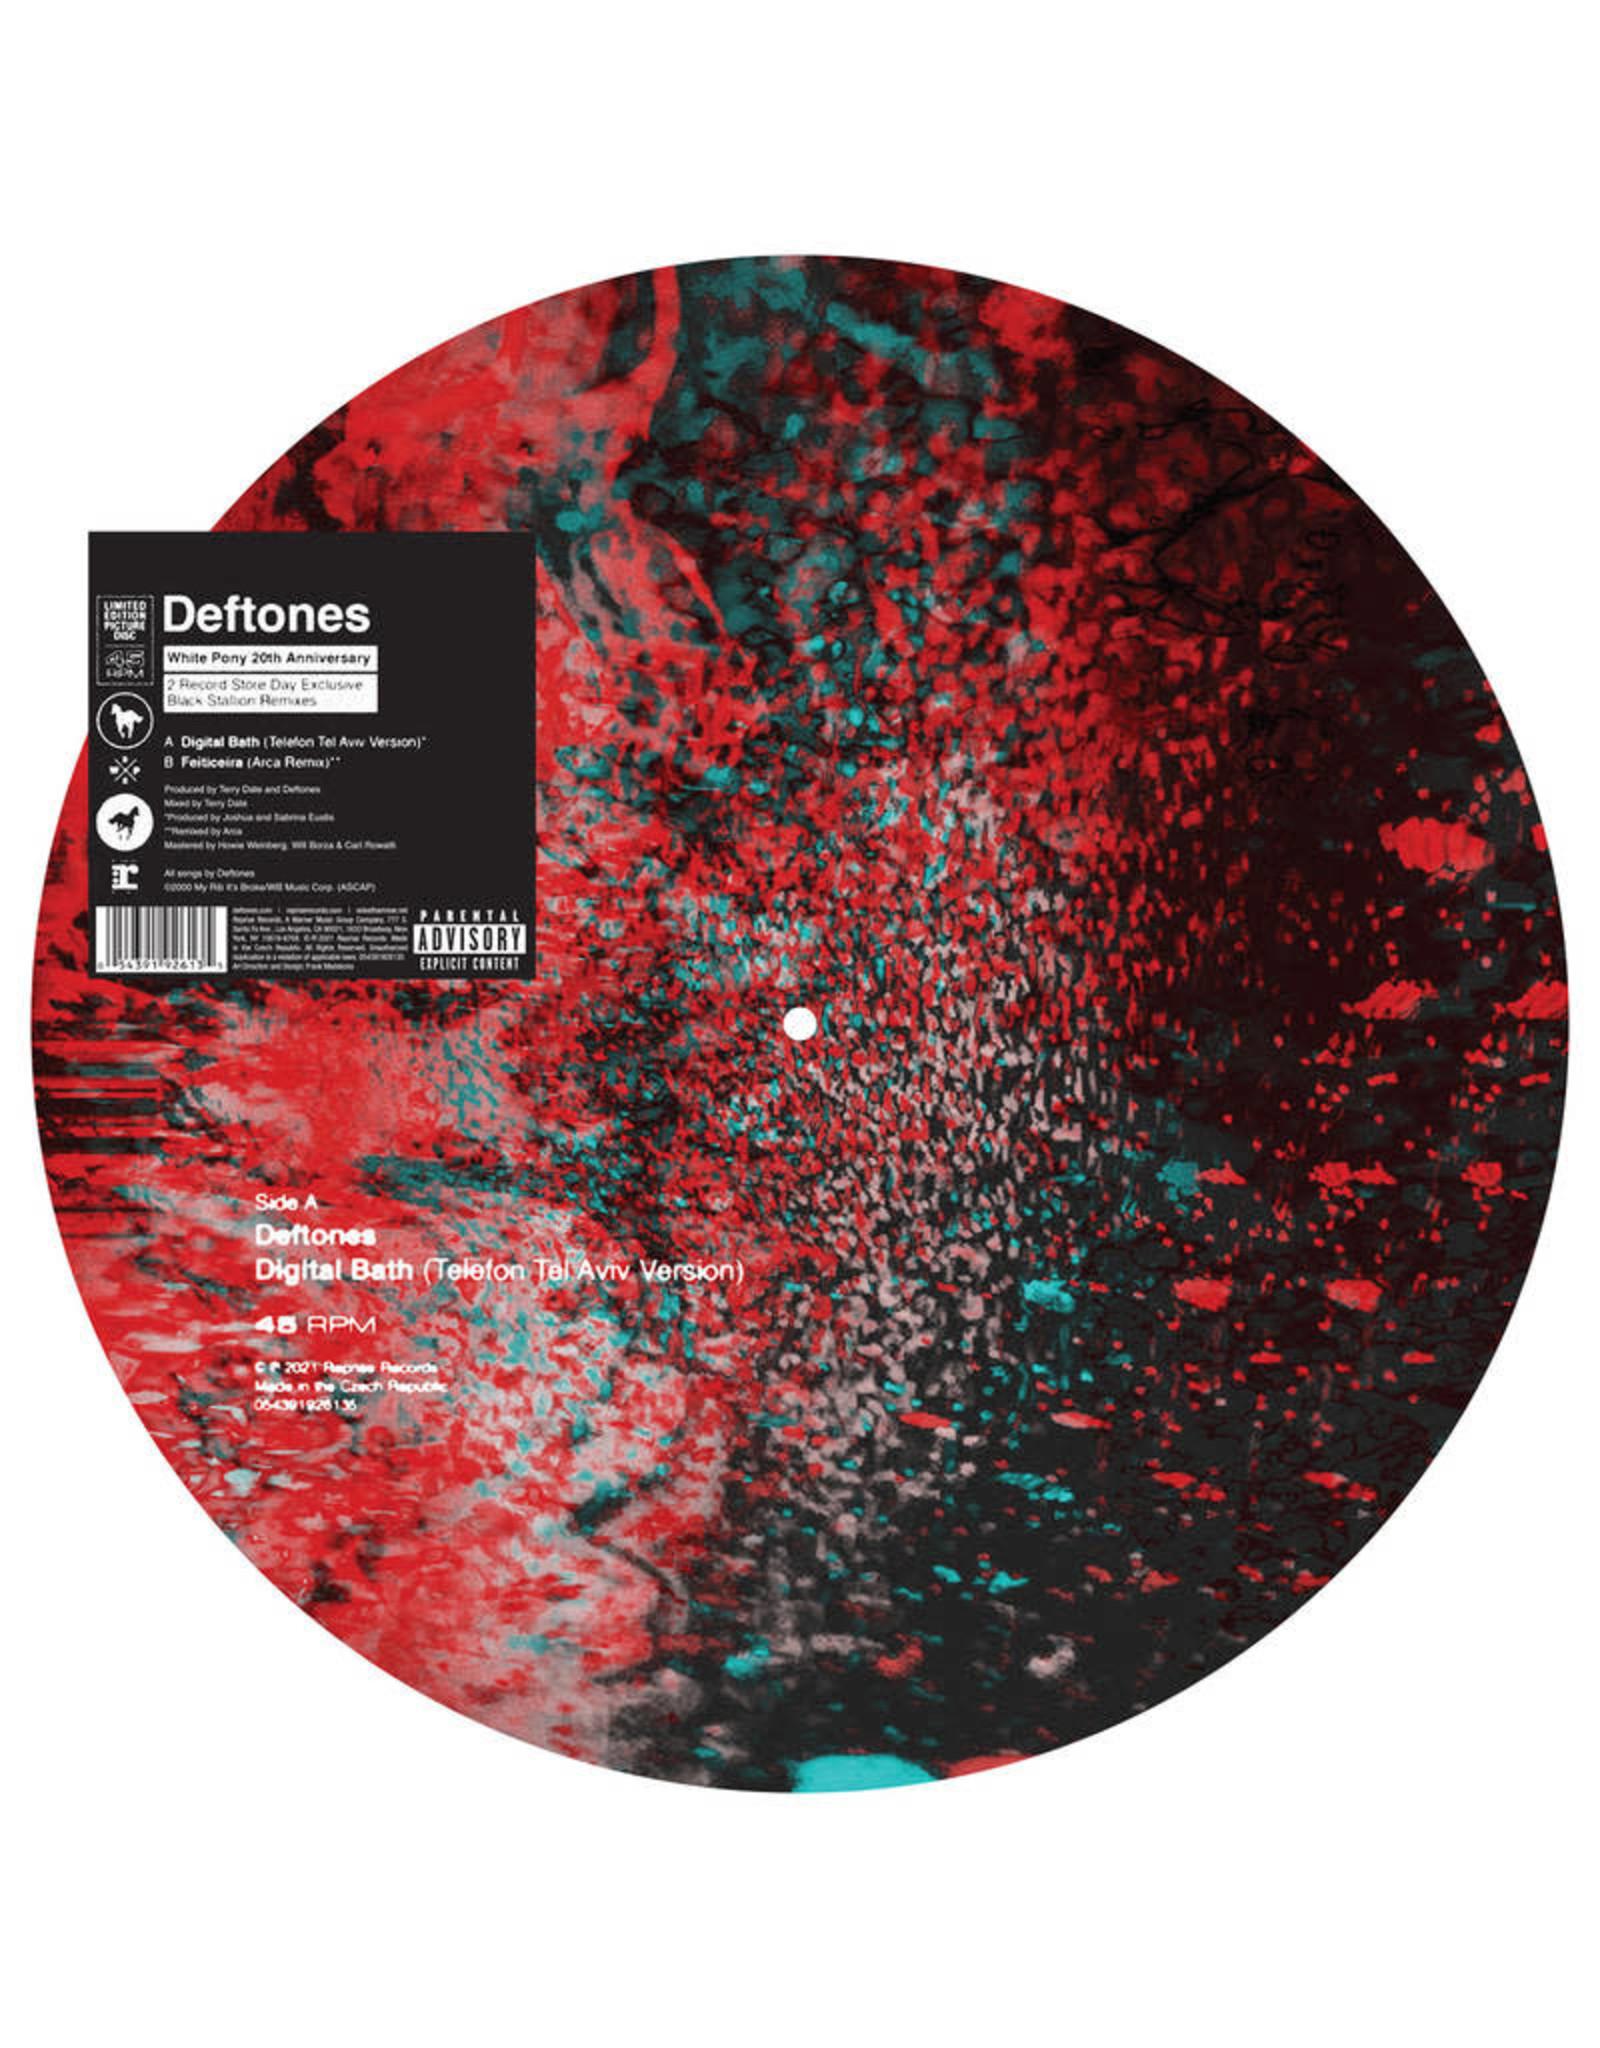 Deftones - Digital Bath EP (Record Store Day)